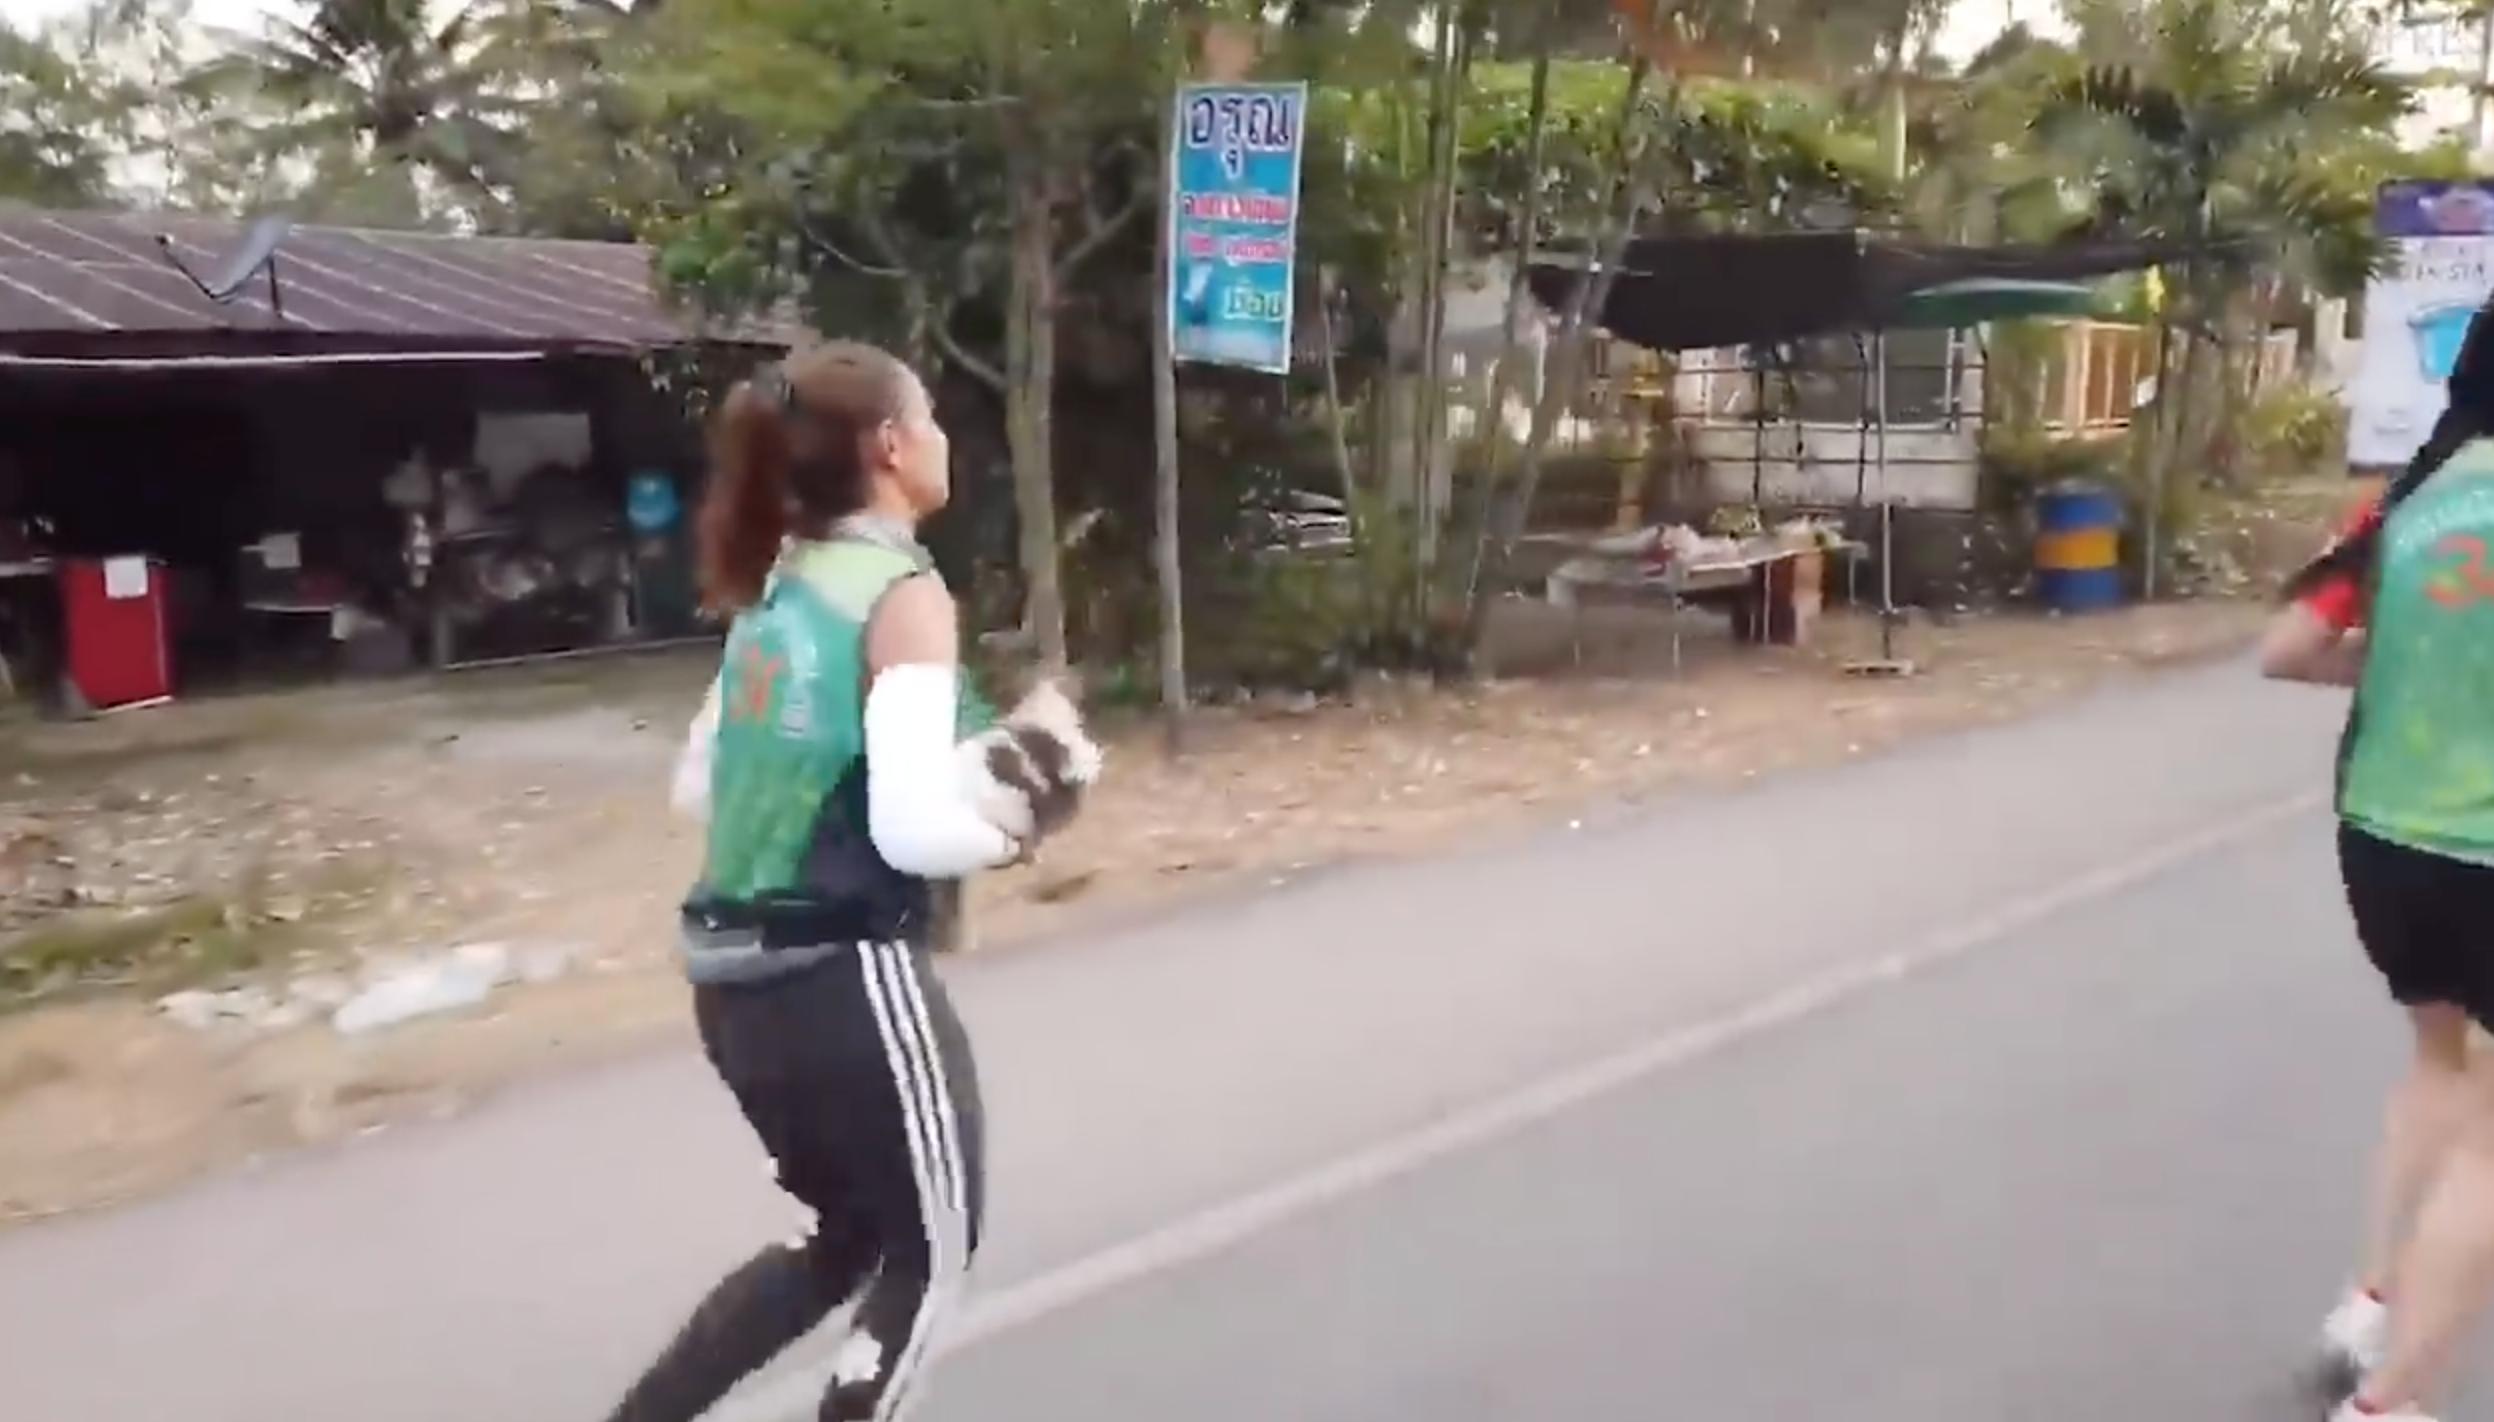 Klongsanun was early into a marathon in Ratchaburi, western Thailand. Credit: Viral Press